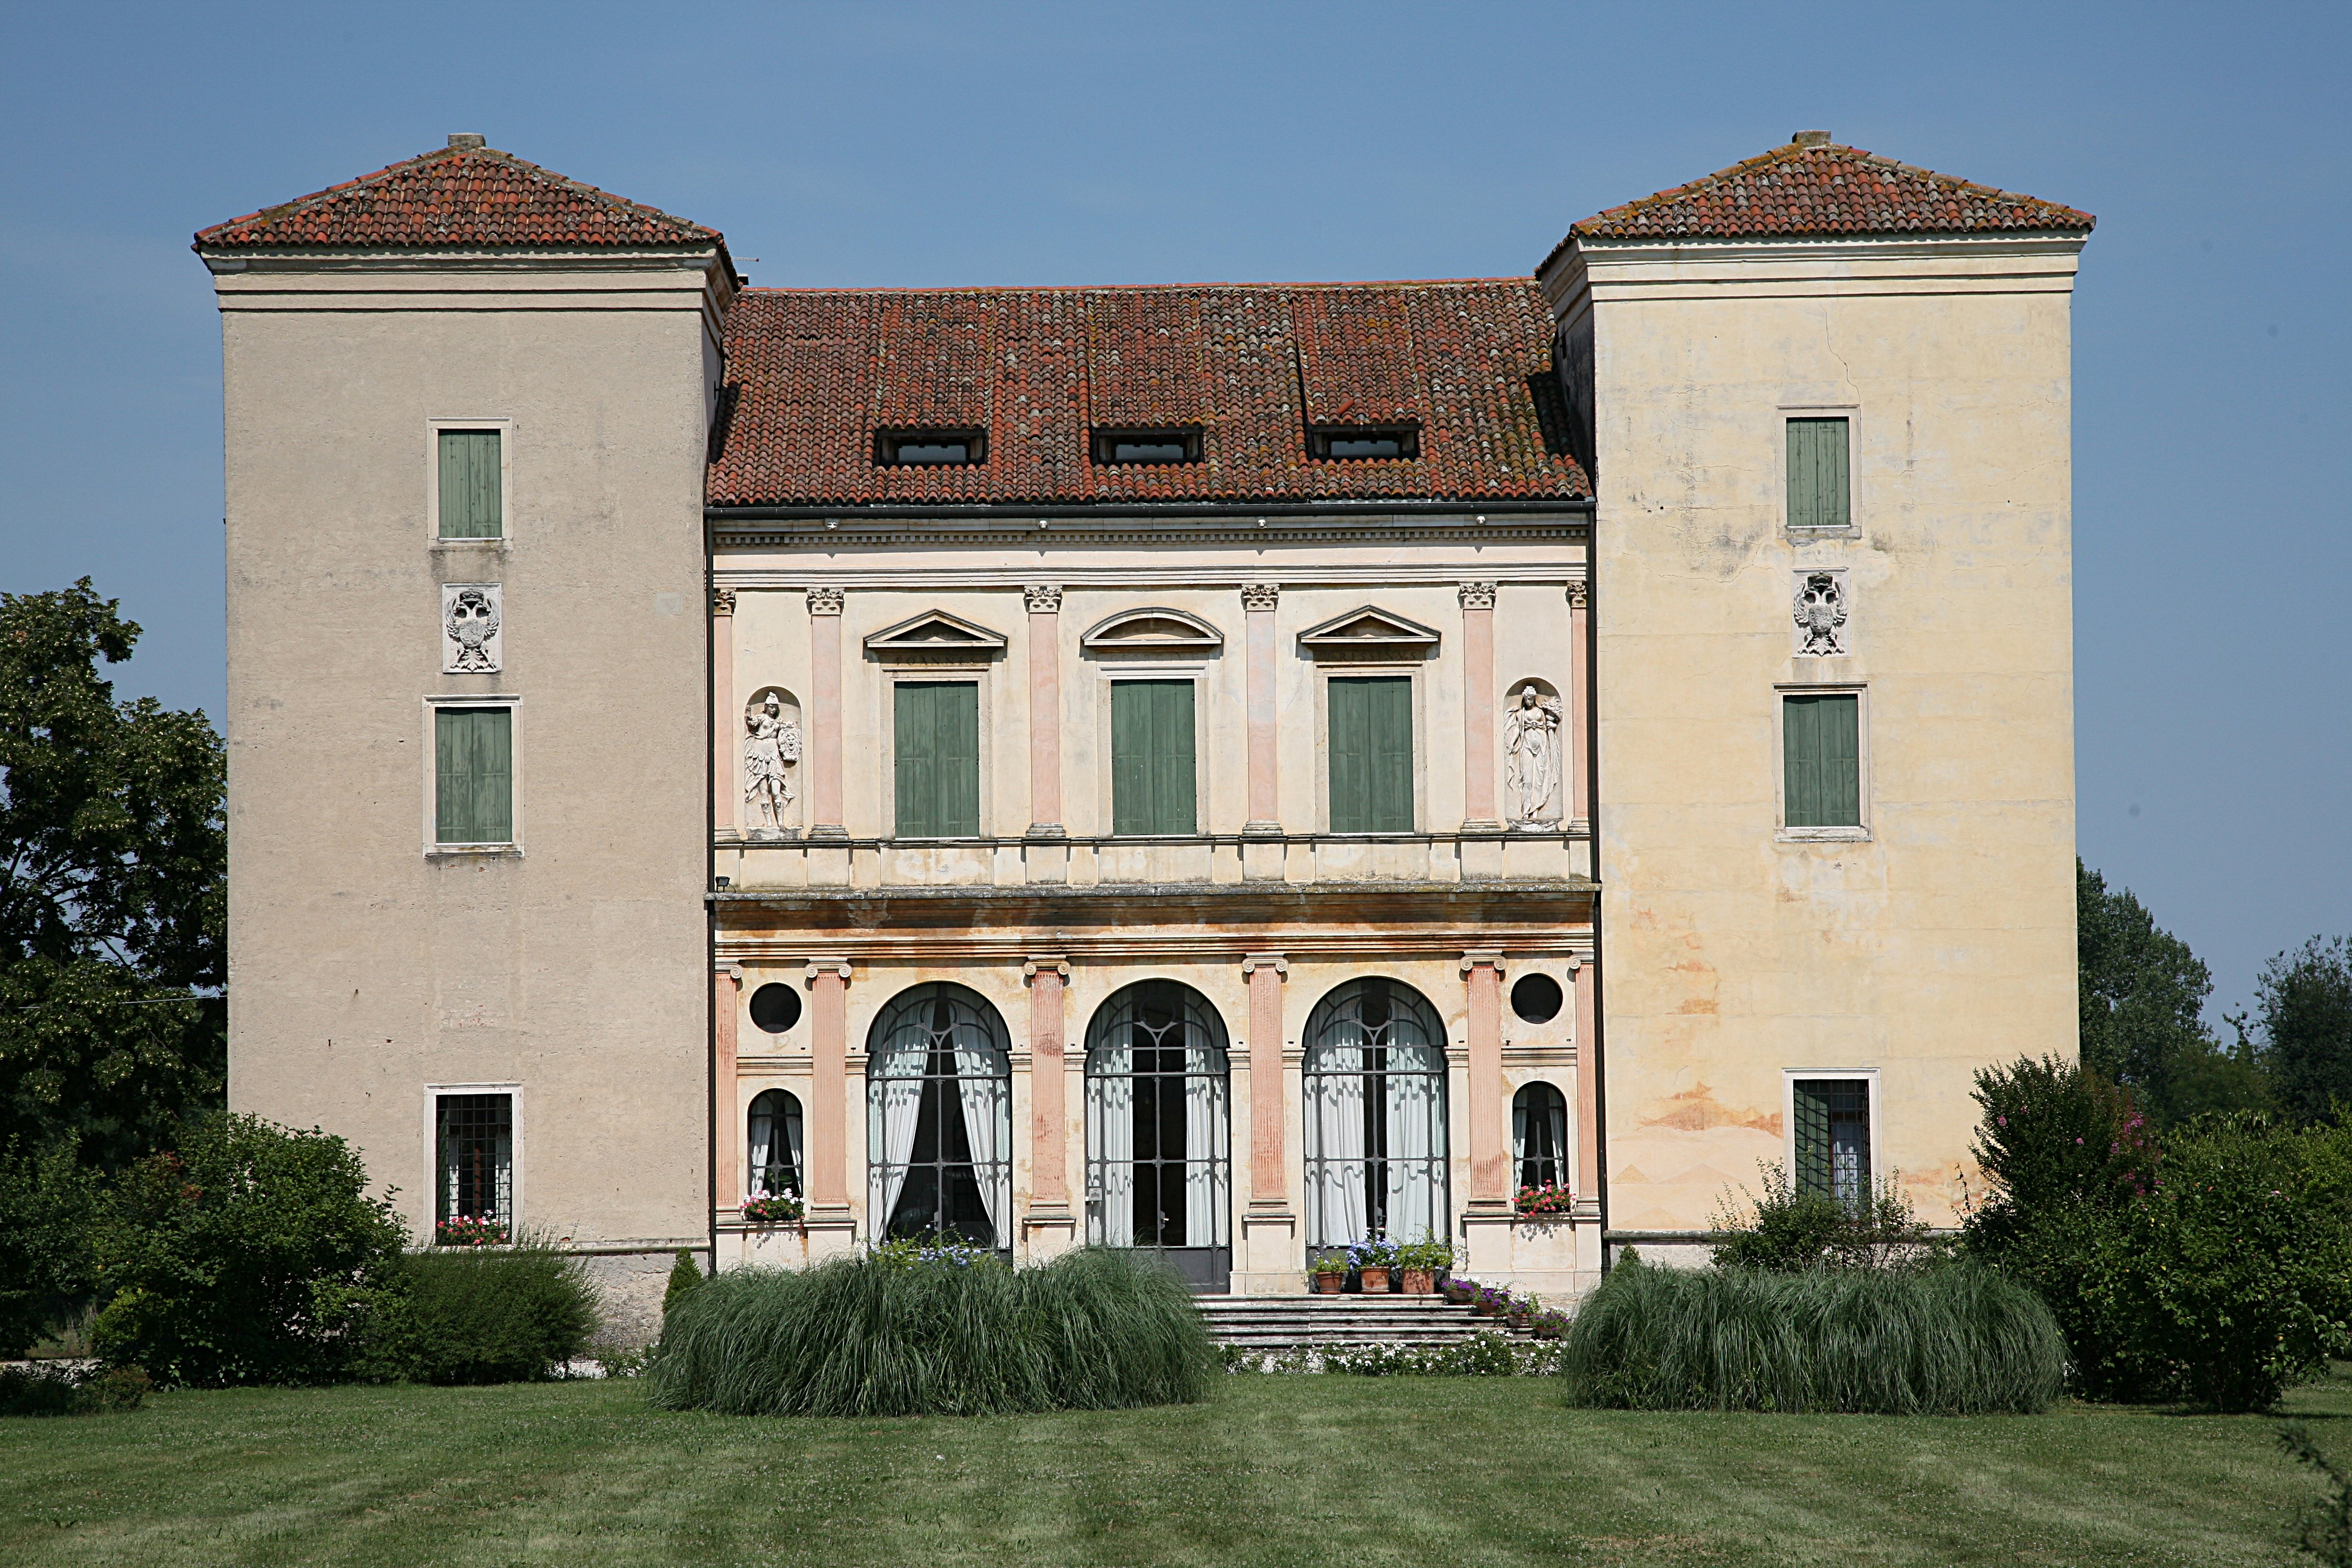 Villa Trissino, Trettenero<br /><br />Patronusának, Gian Giorgio Trissinonak a villája.<br /><br />Kép: Wikimedia Commons / Hans A. Rosbach